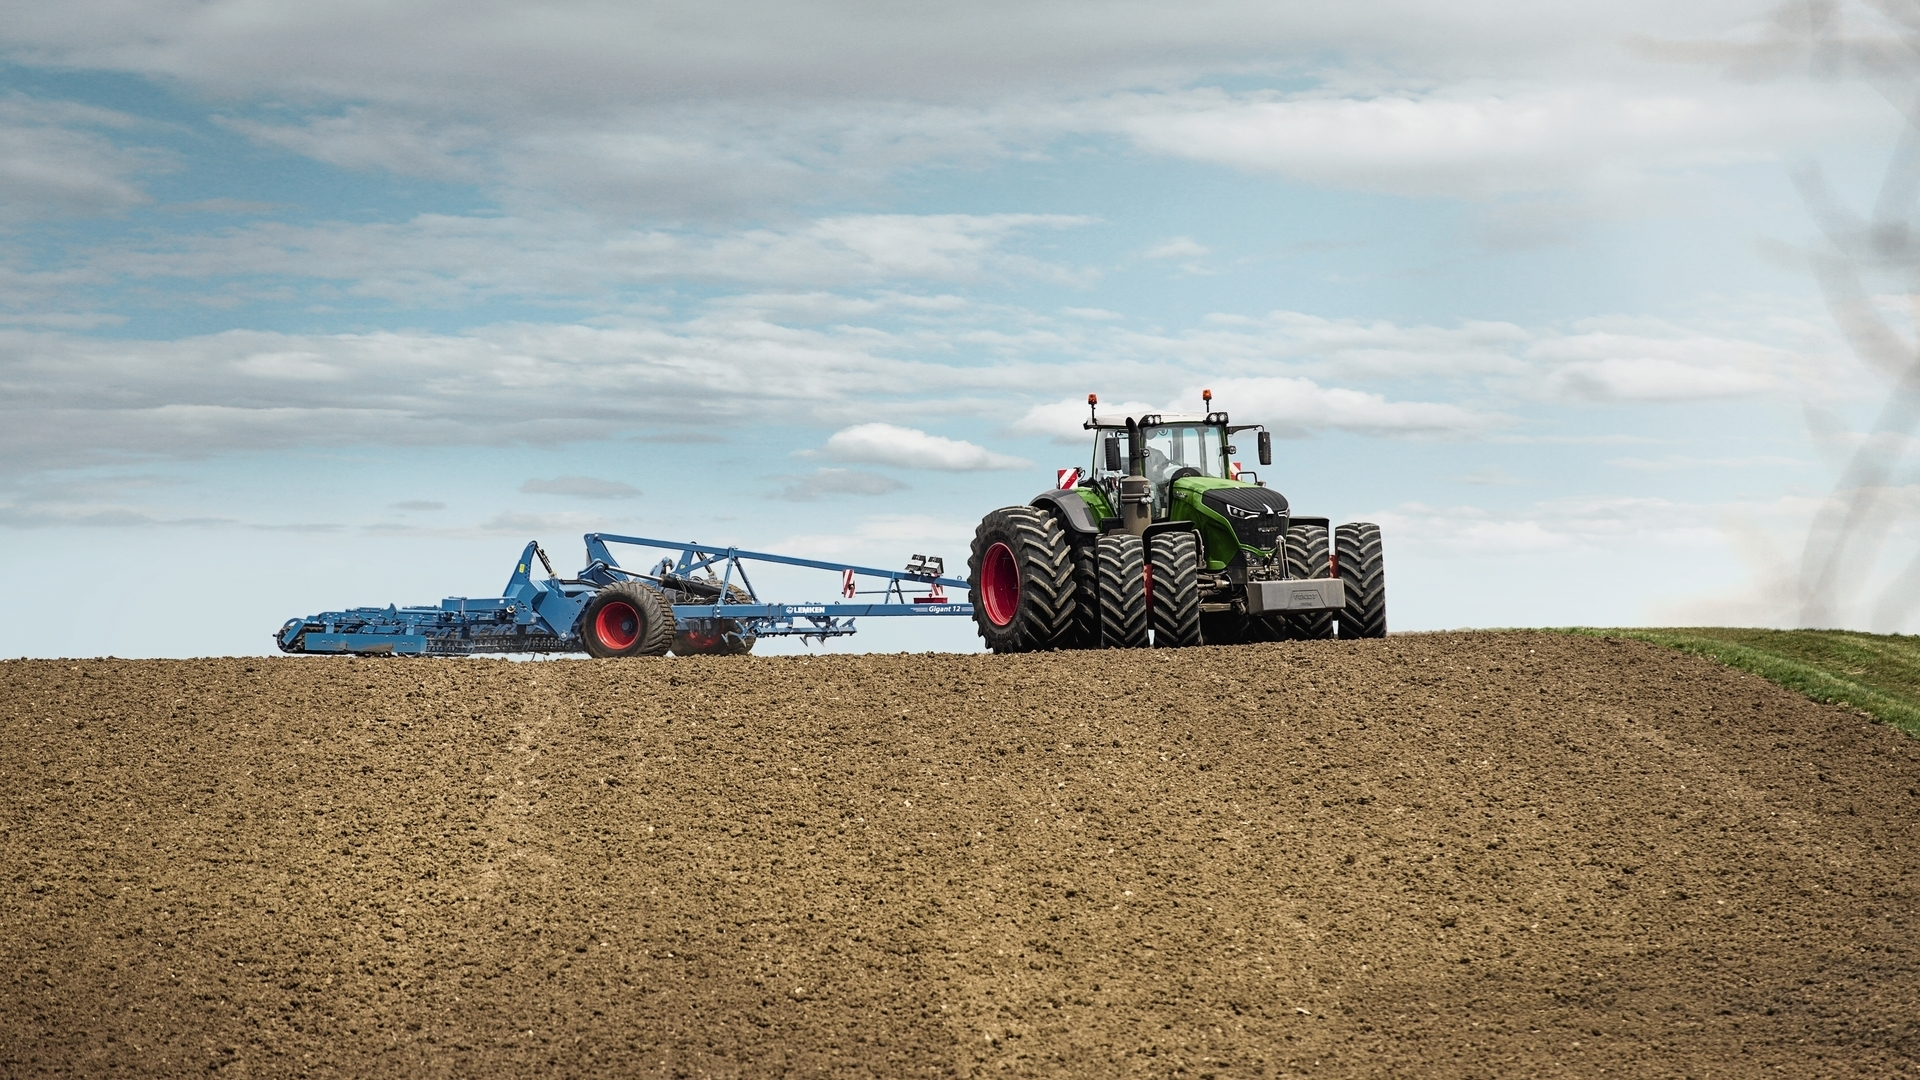 Quote Wallpaper Hd Phone Fendt 1000 Series Tractors Maple Lane Farm Service